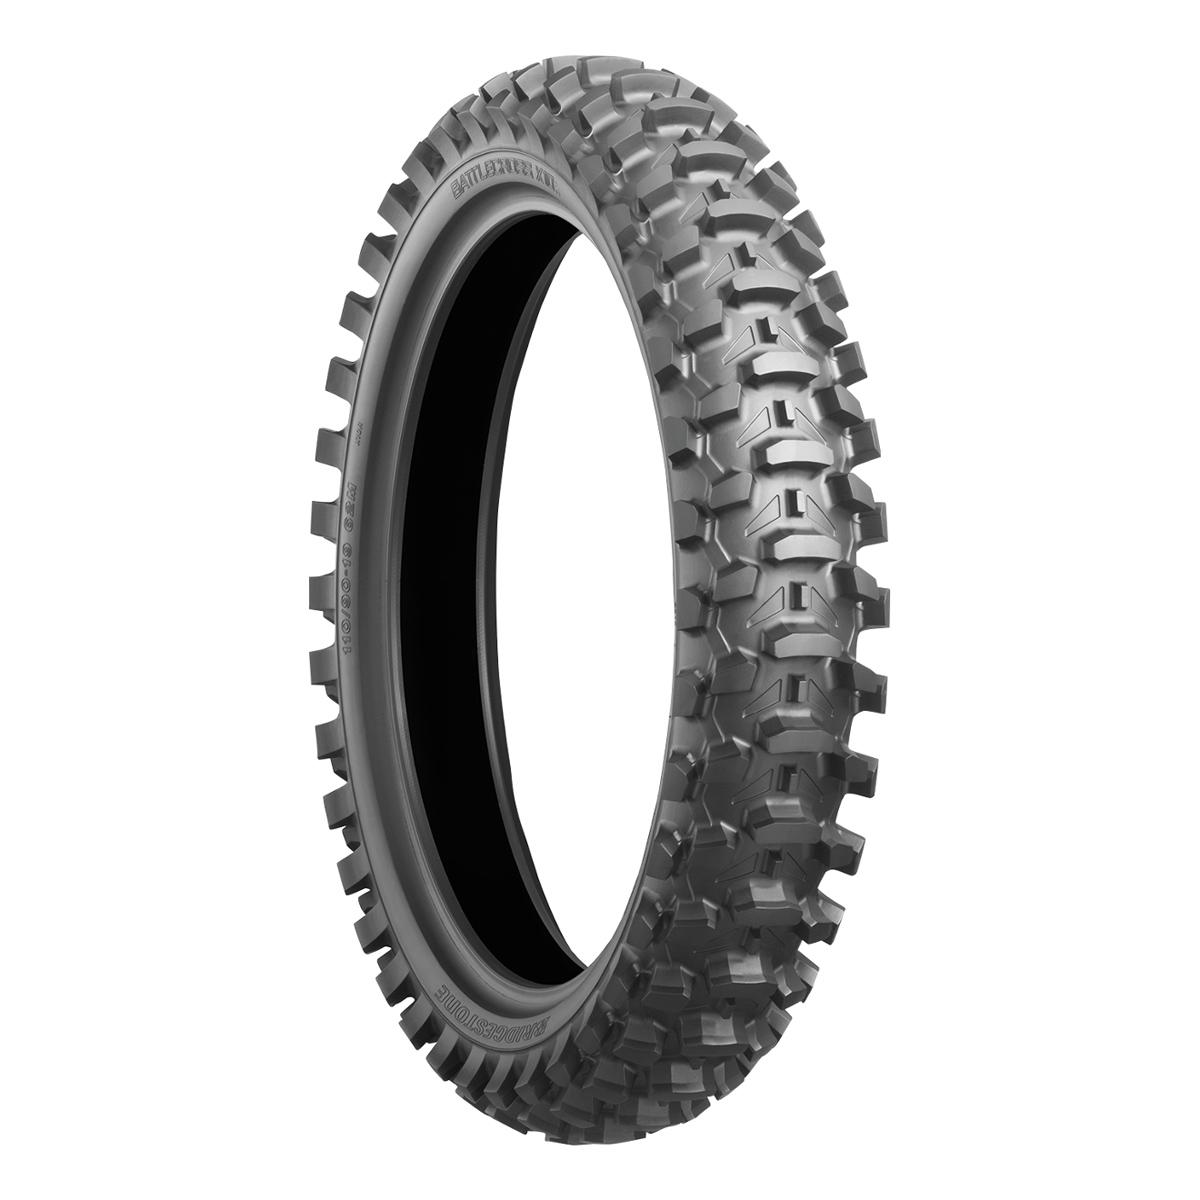 Bridgestone Battlecross X10R 100/90-19 Tire